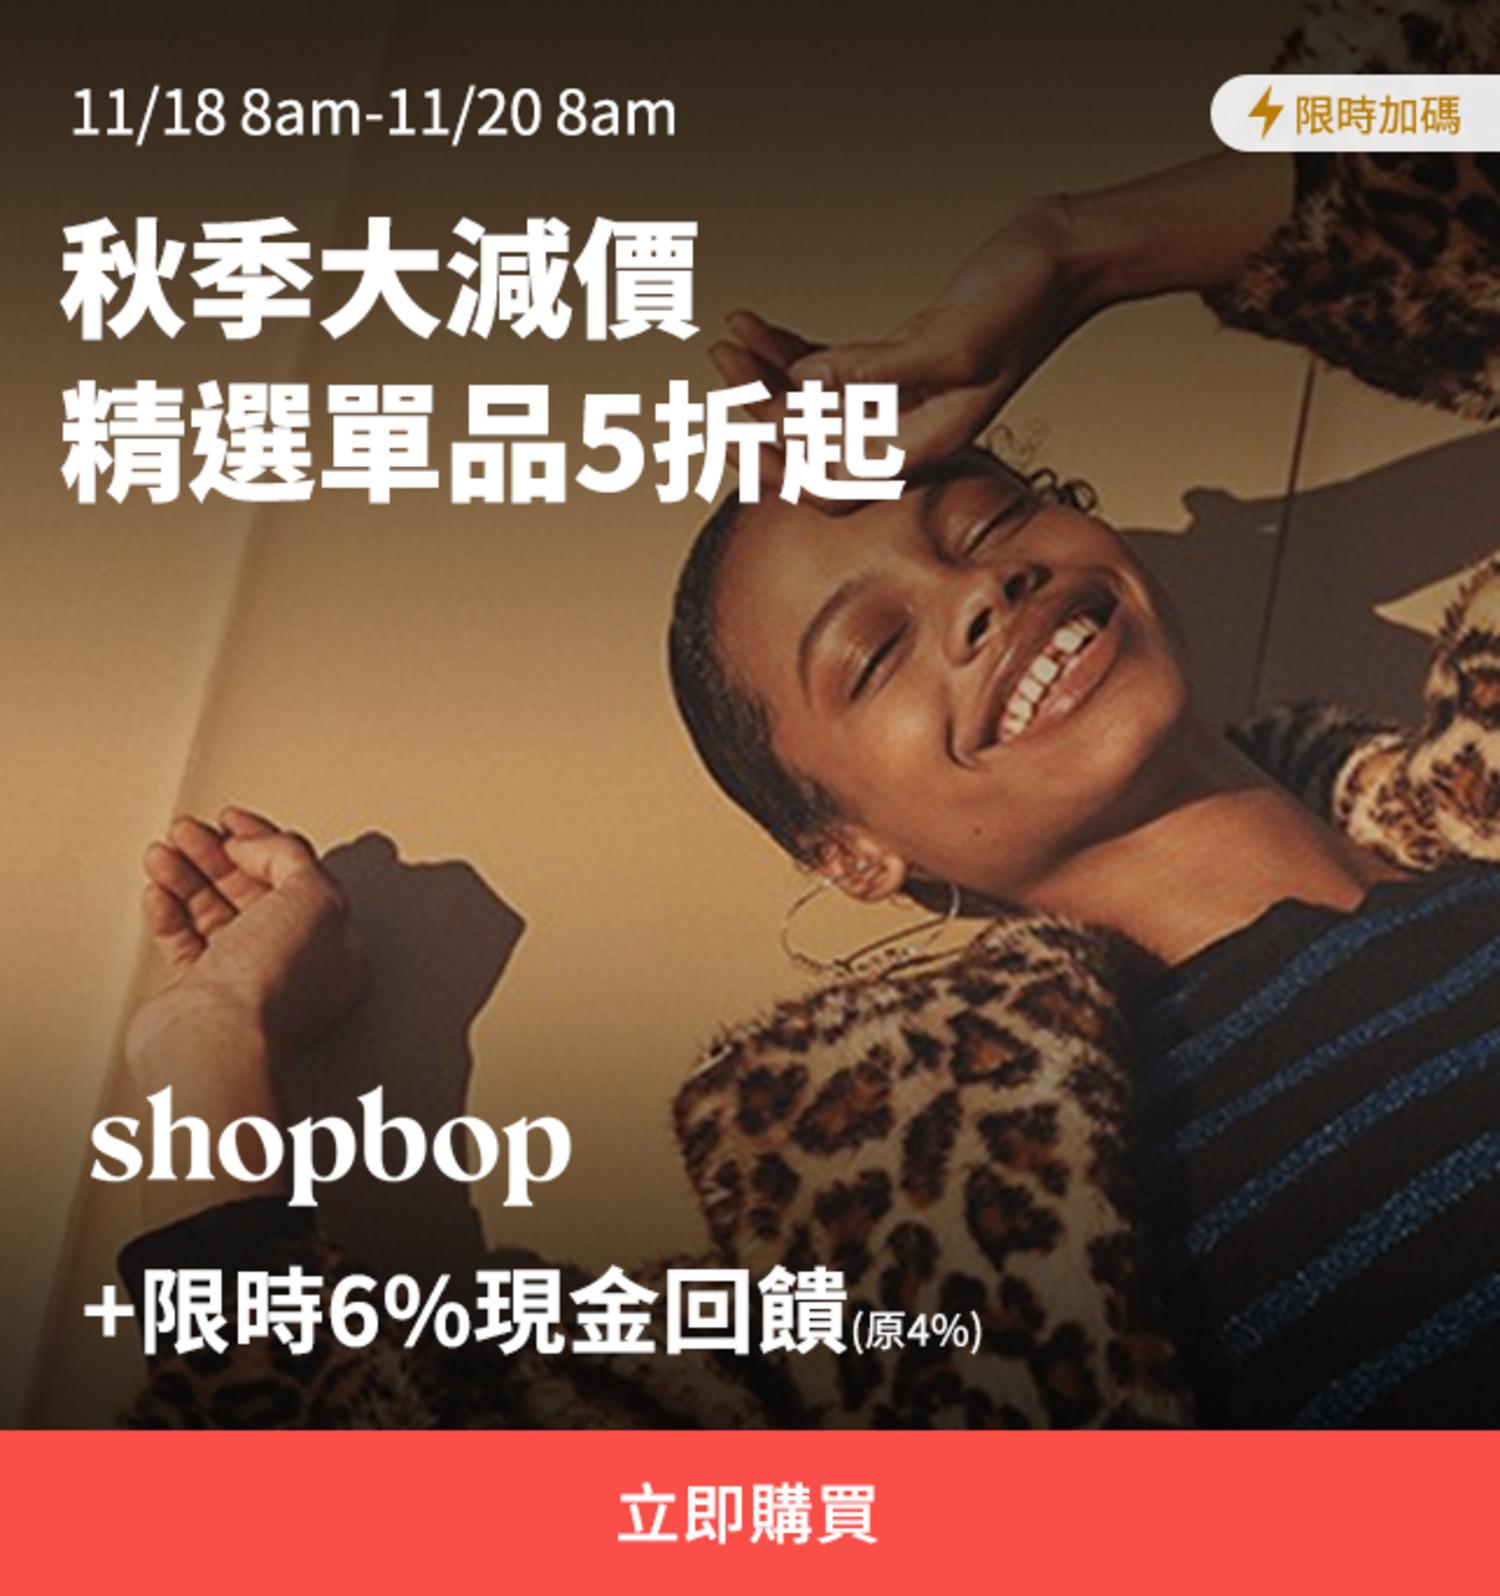 Shopbop 11/18 8am-11/20 8am